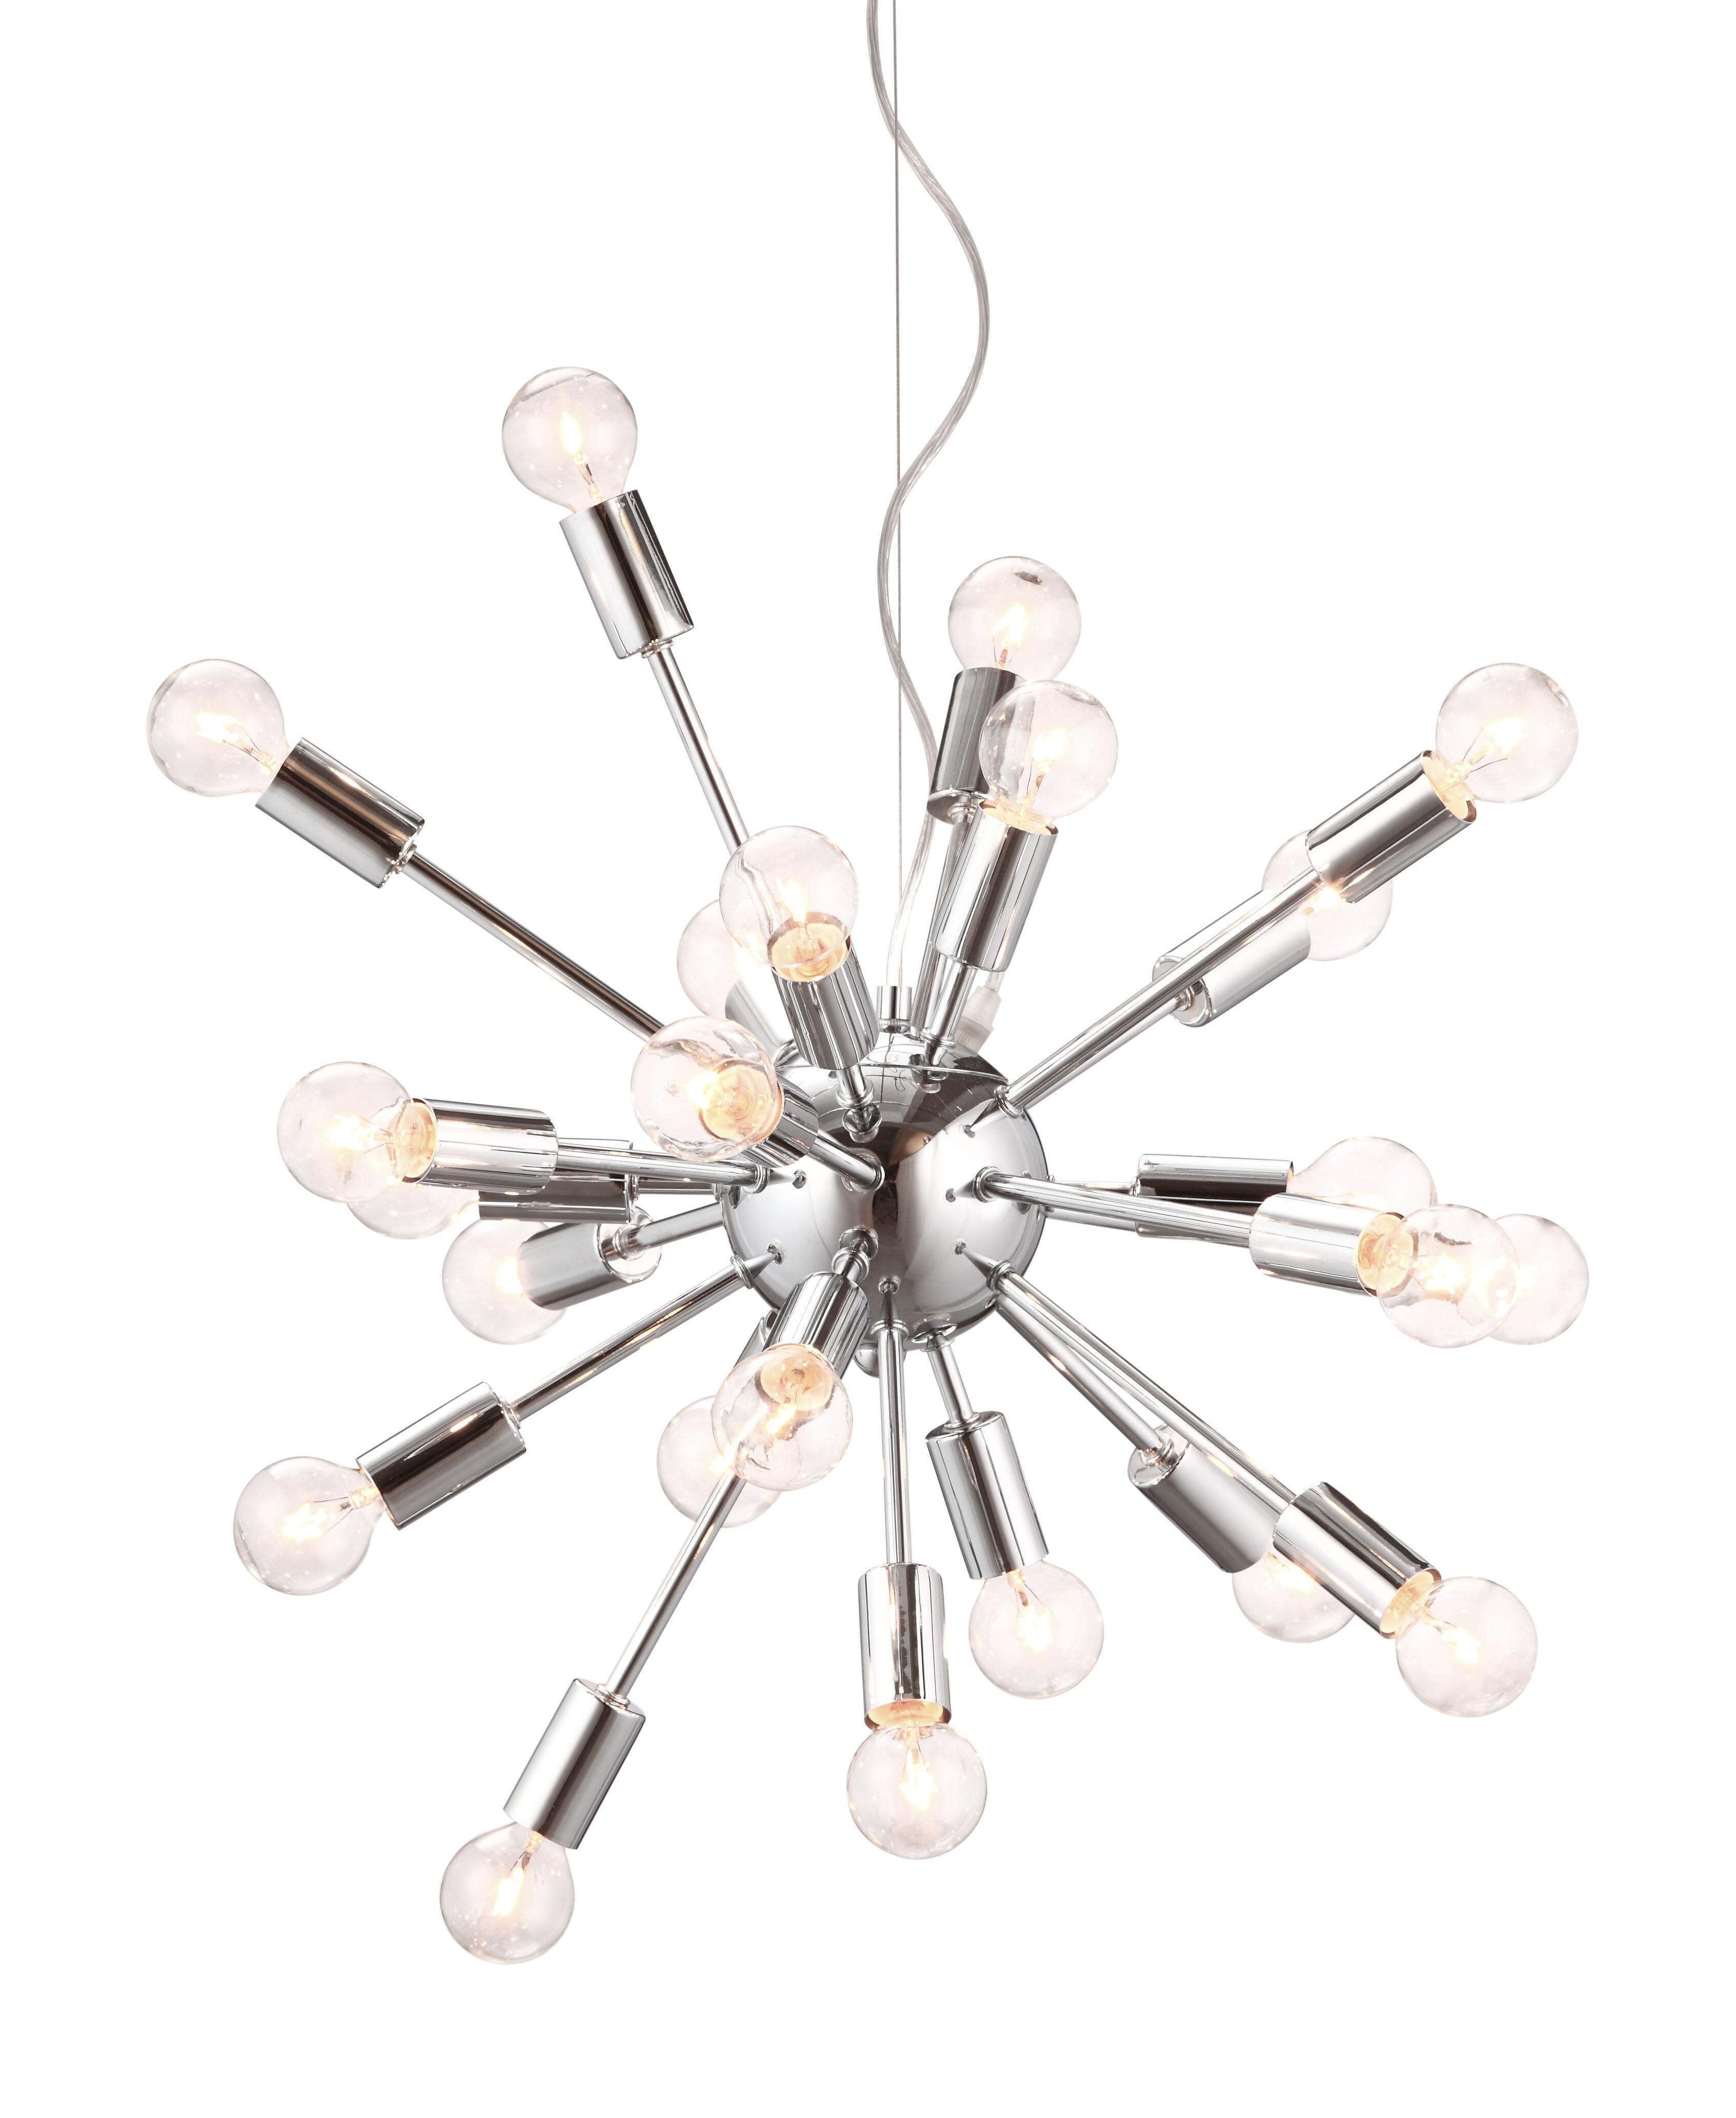 dcor design pulsar 24 light chandelier reviews wayfair Blue LED Flood Light Bulbs